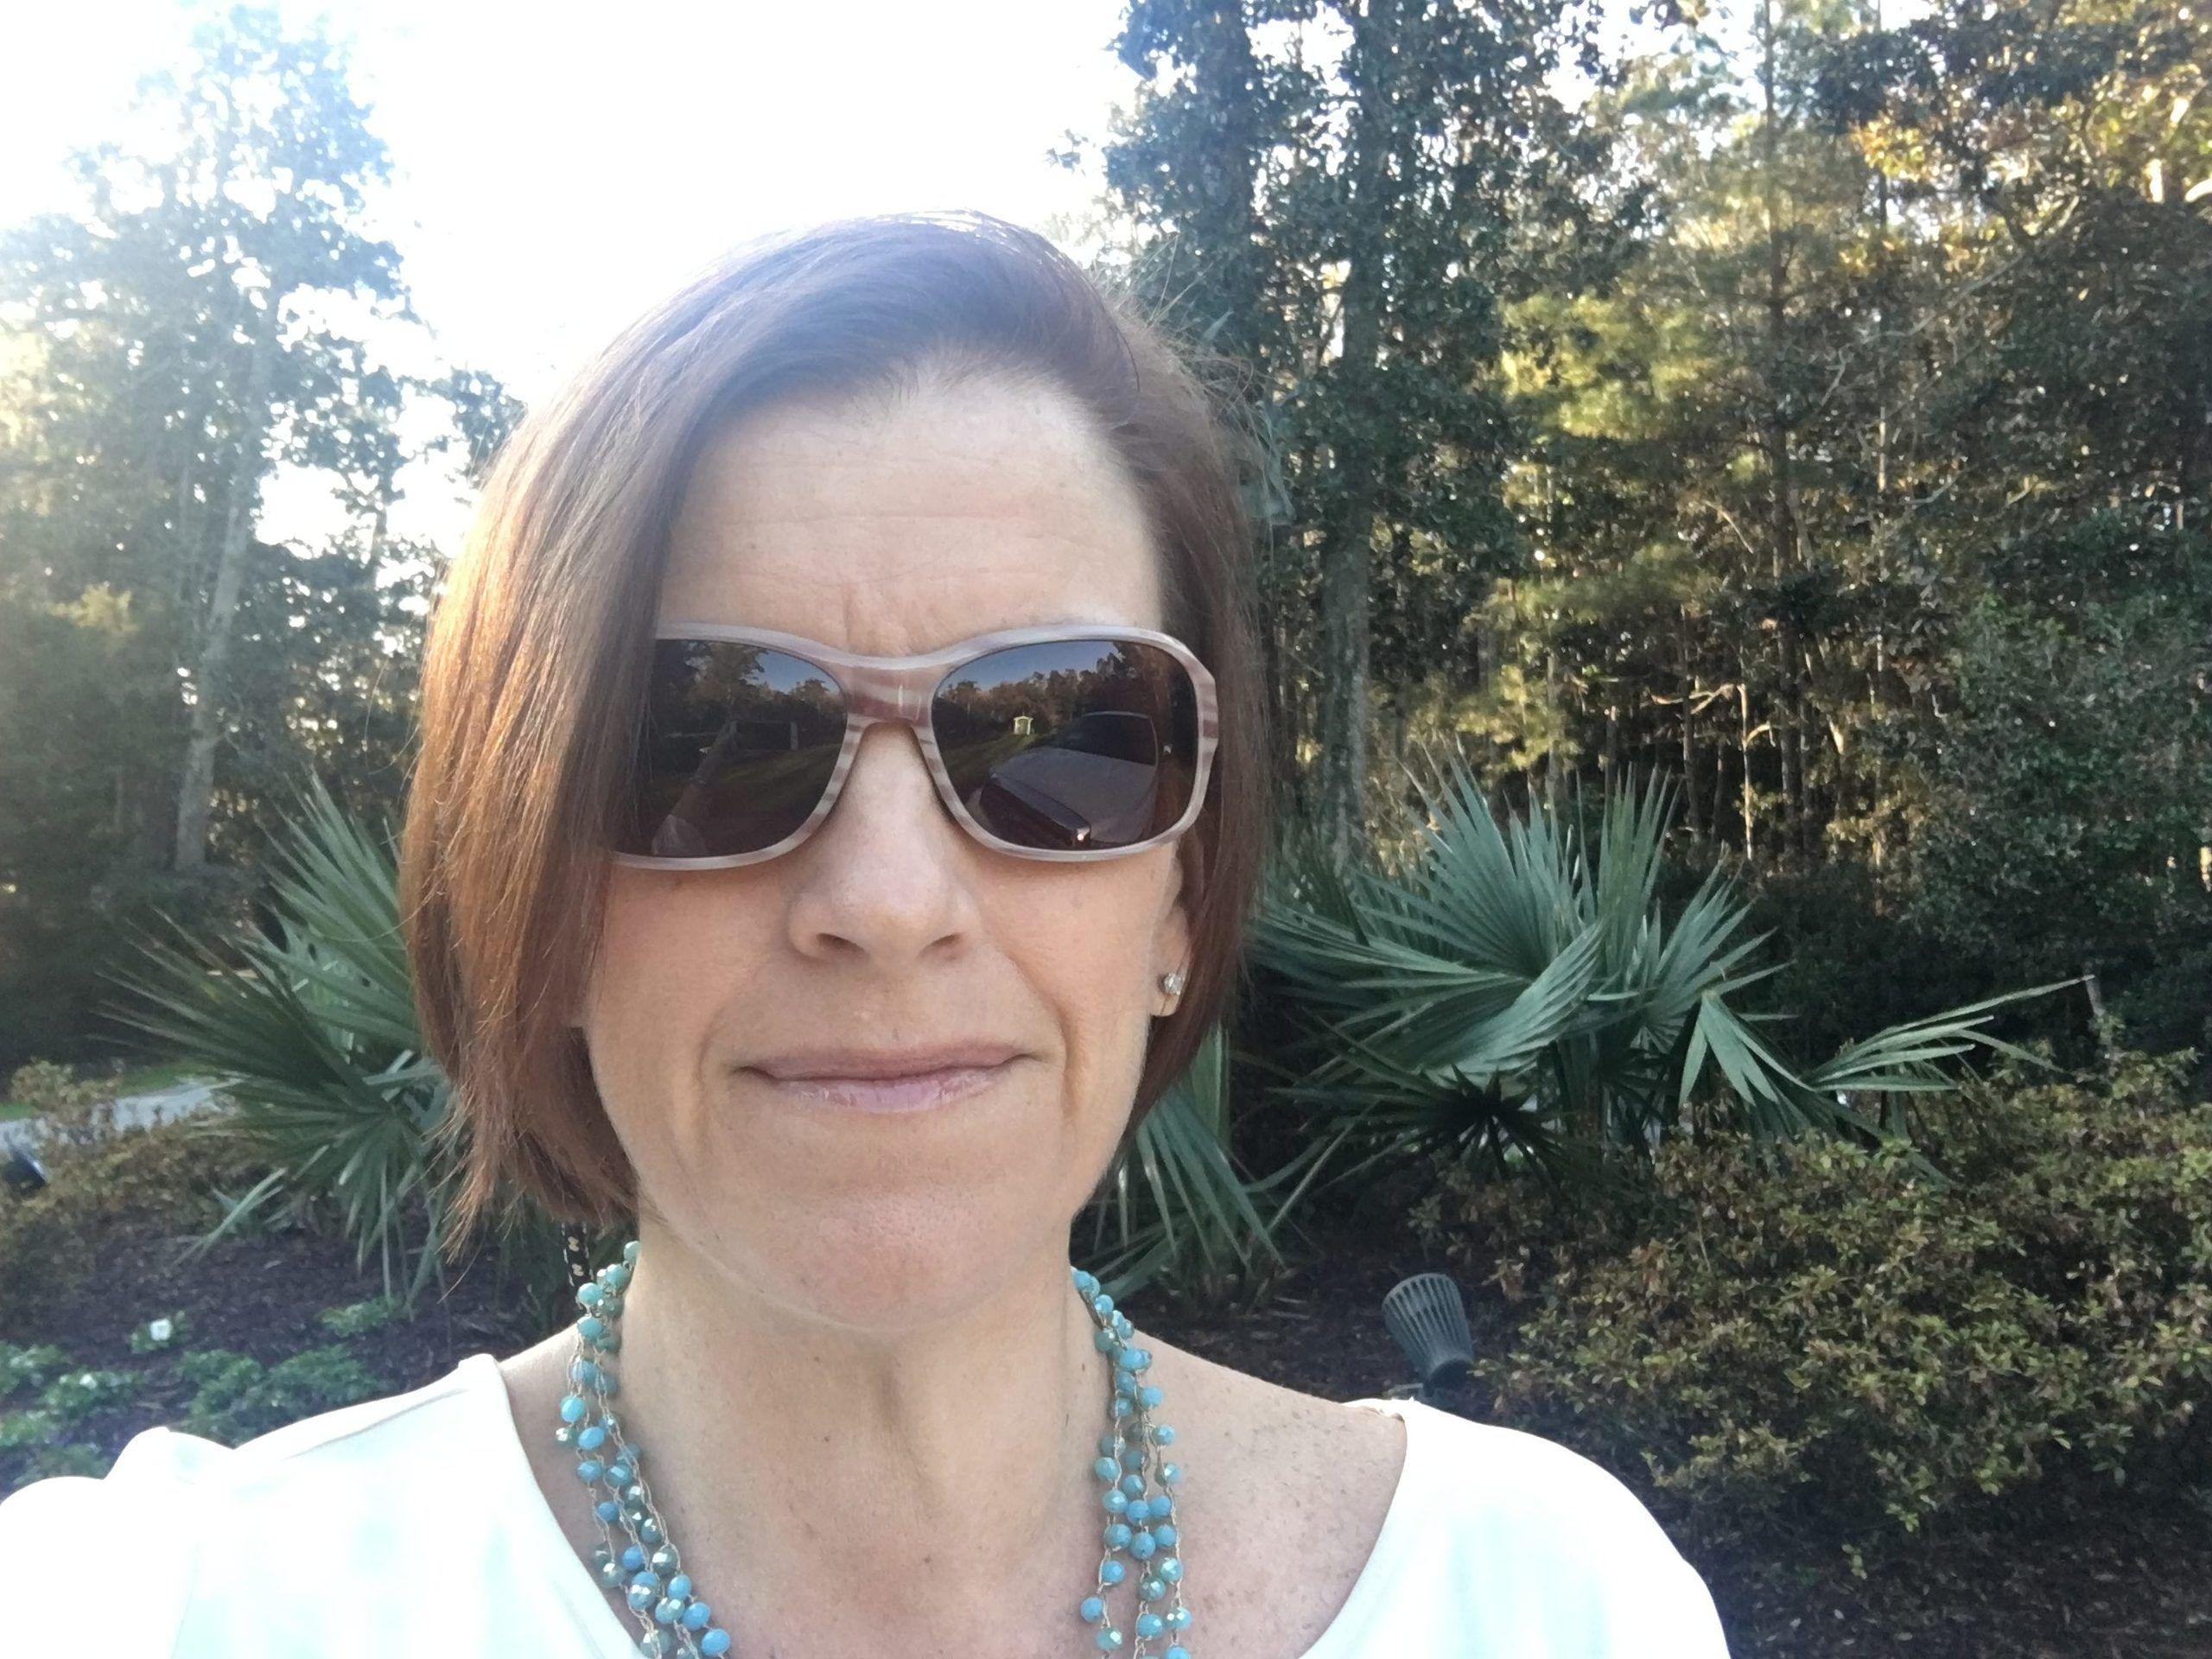 Melanie Cameron at Airlie Gardens